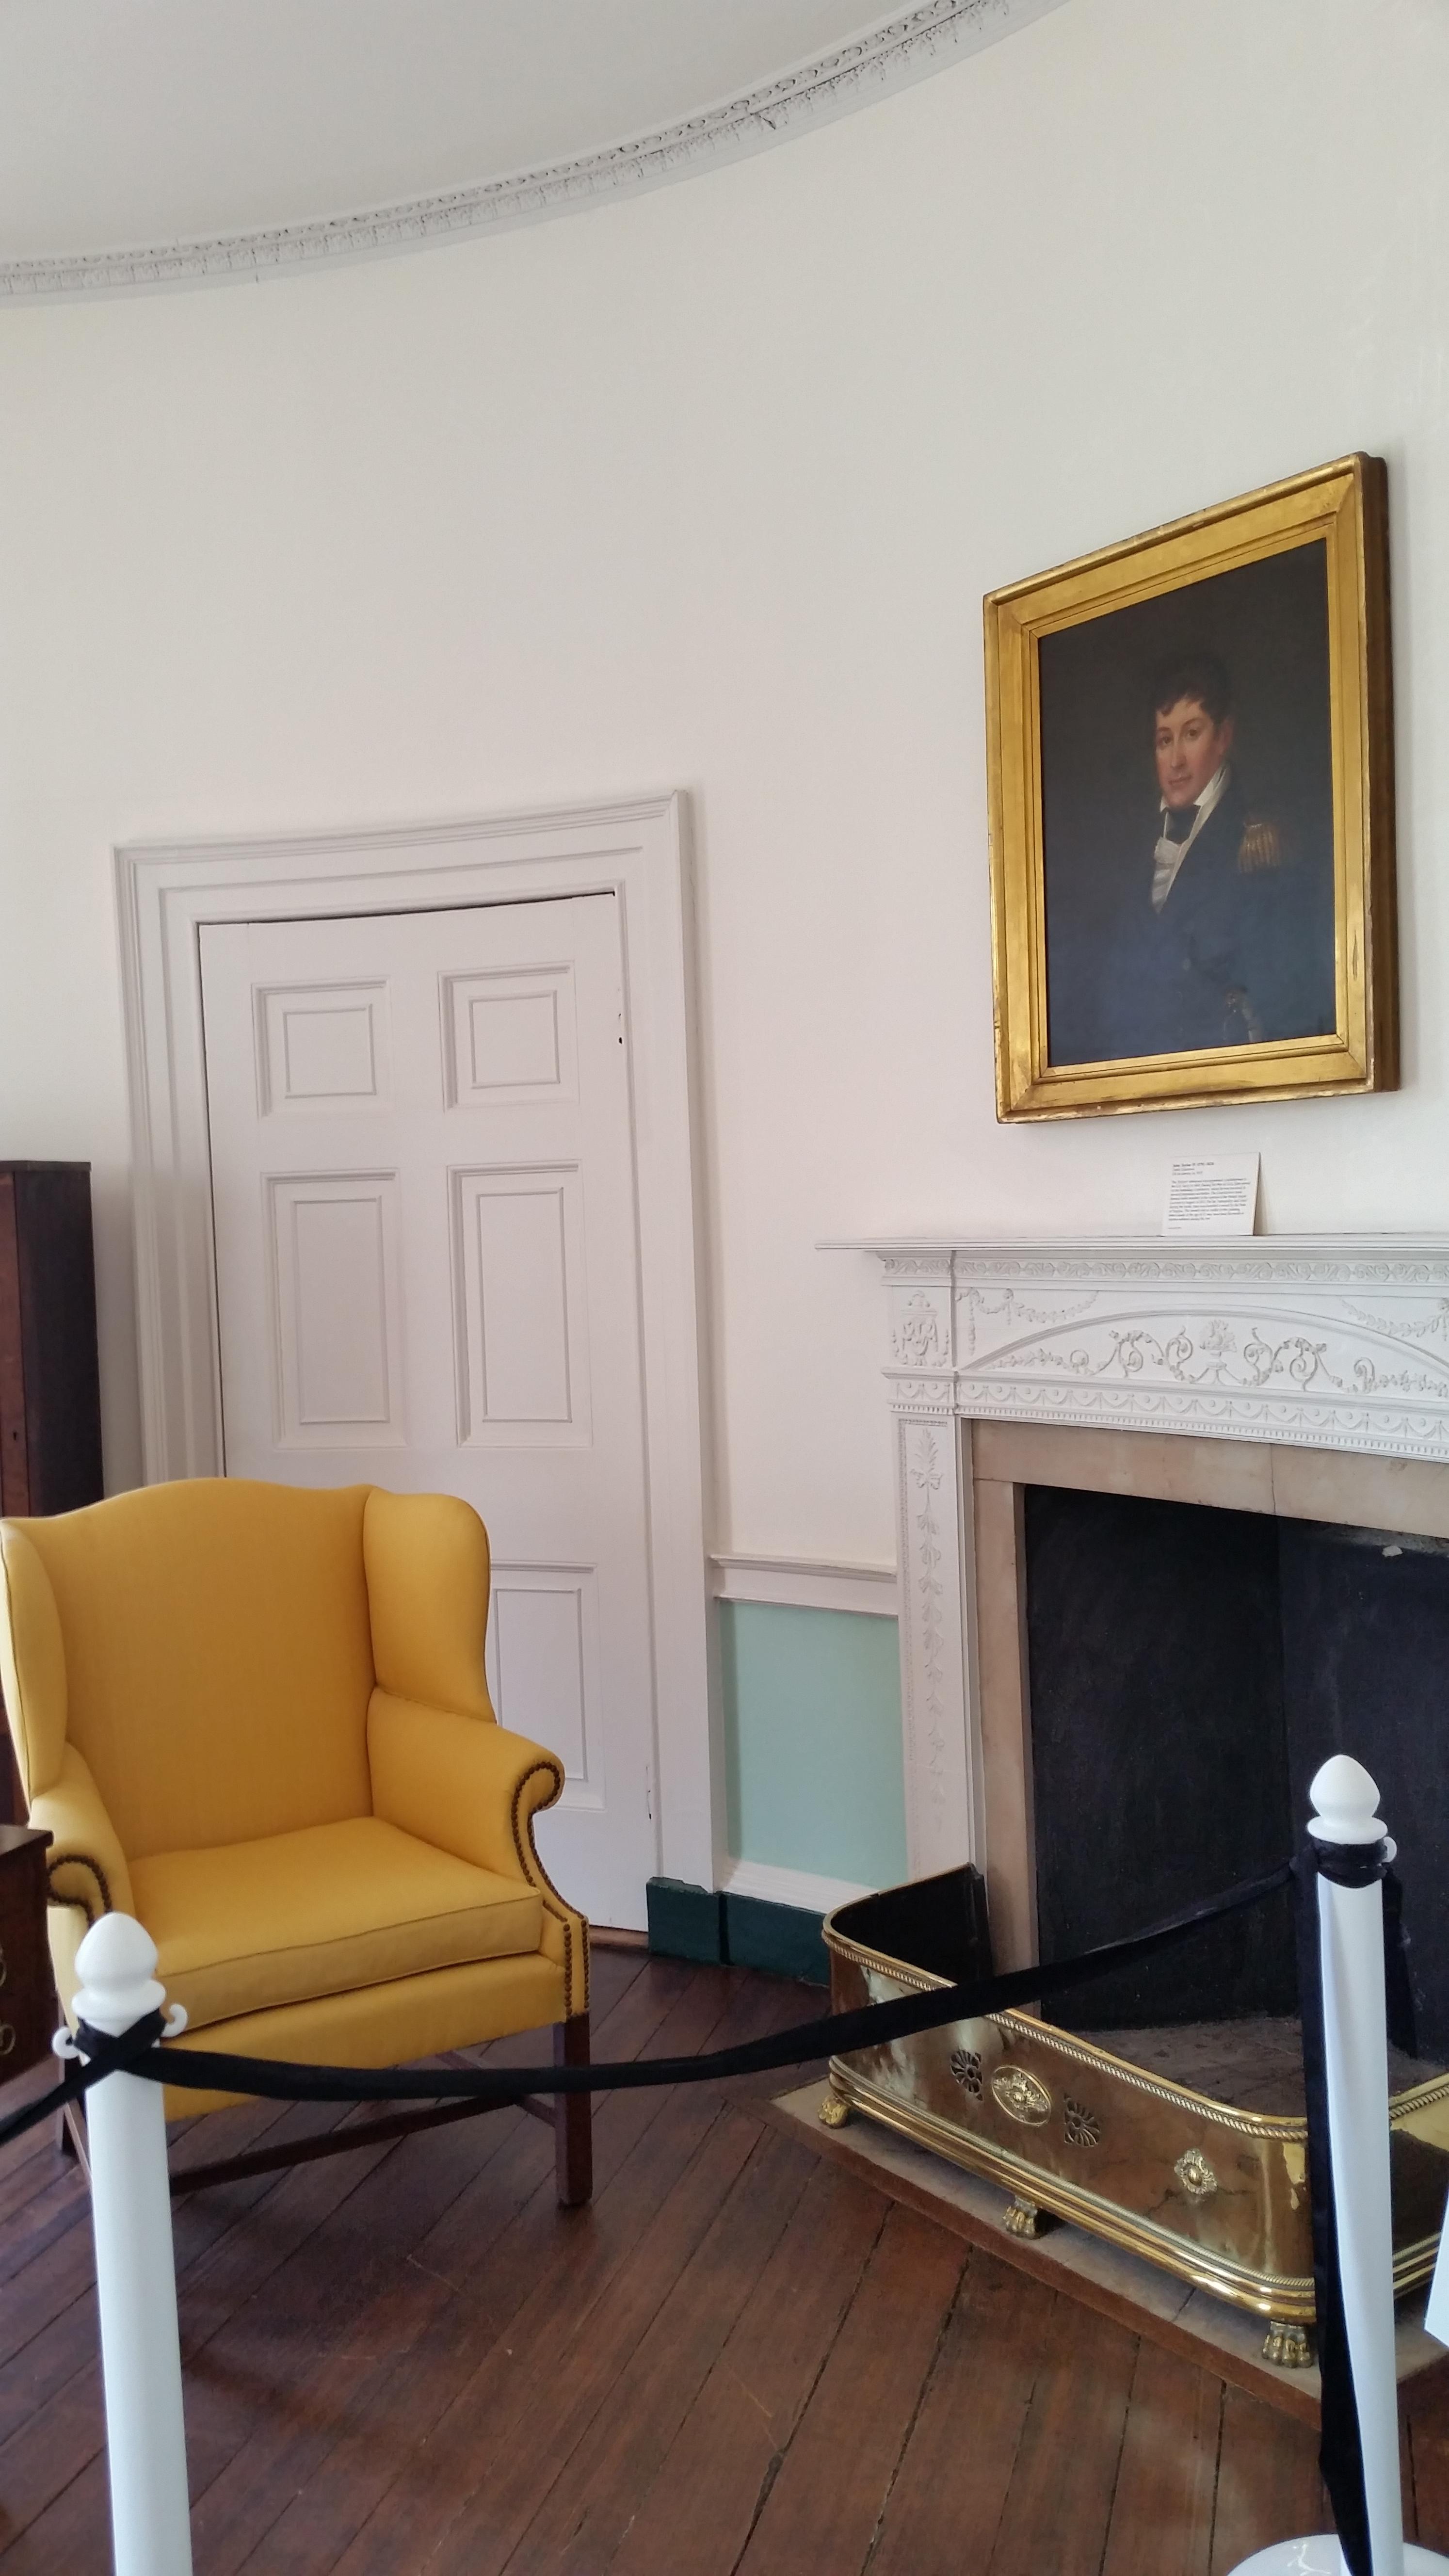 Treaty Room with John Tayloe IV picture